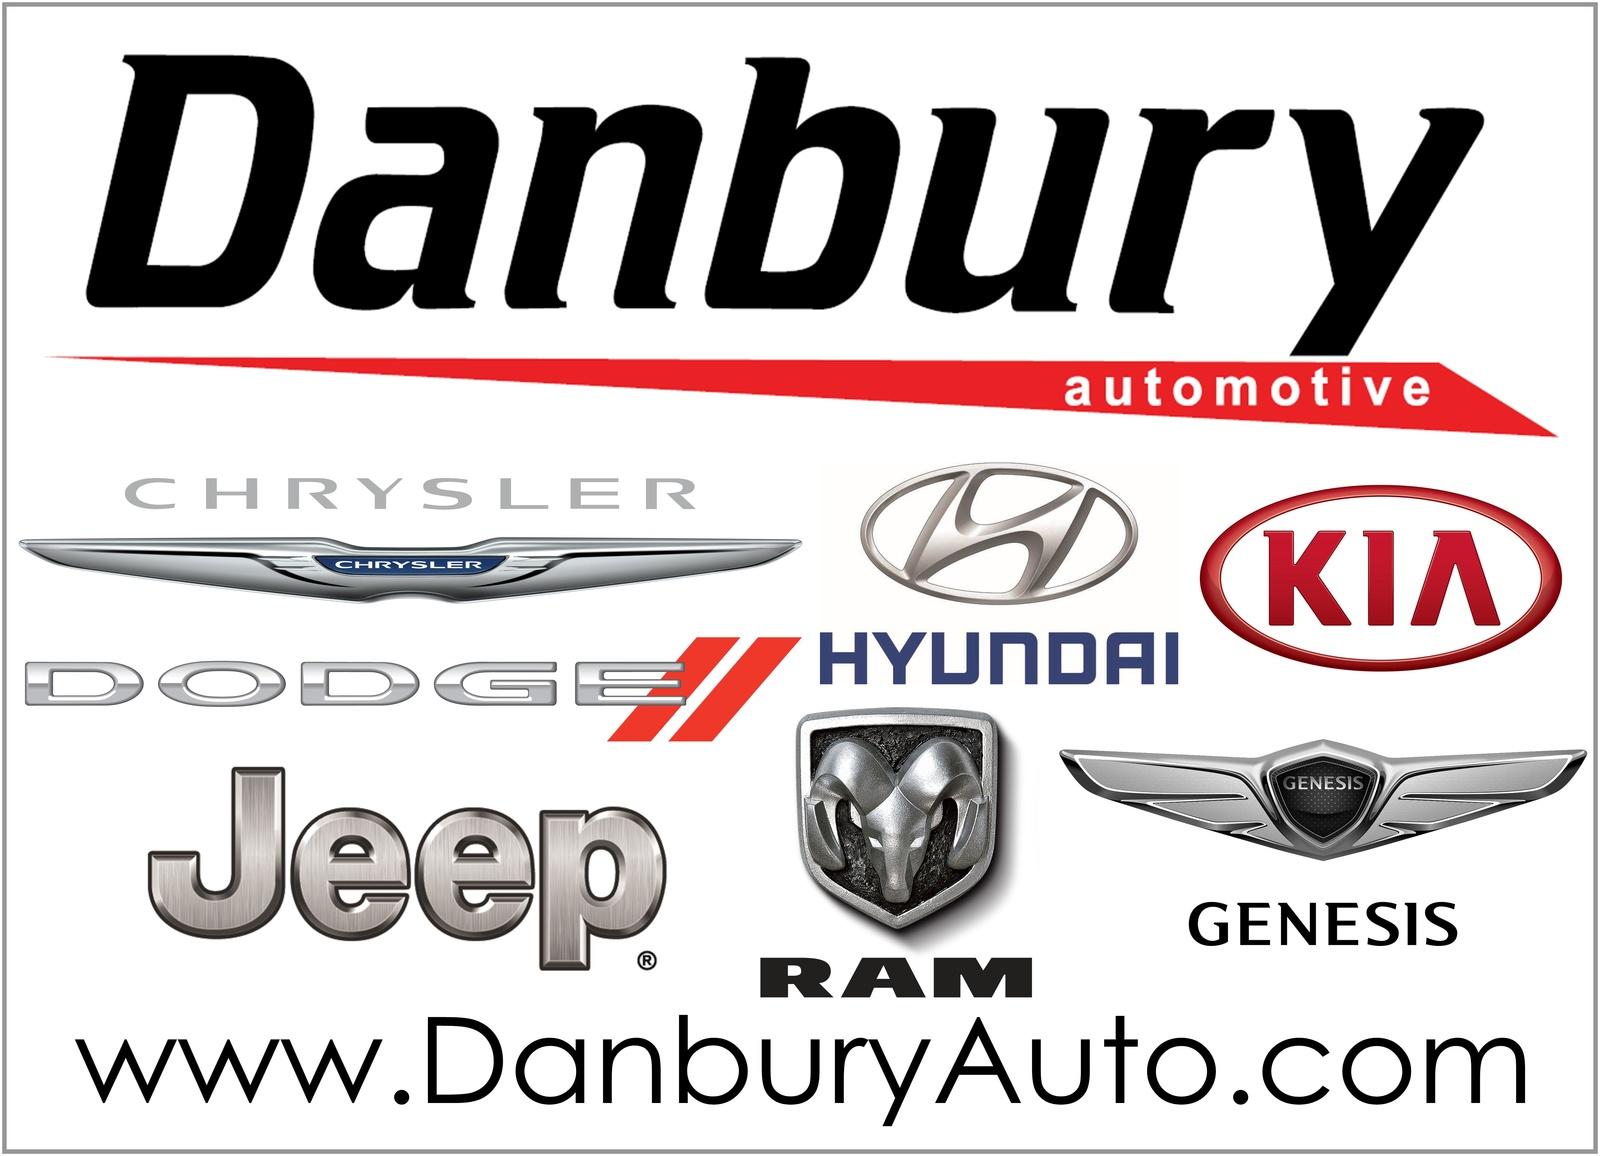 Danbury hyundai cdjr kia danbury ct read consumer reviews danbury hyundai cdjr kia danbury ct read consumer reviews browse used and new cars for sale biocorpaavc Image collections